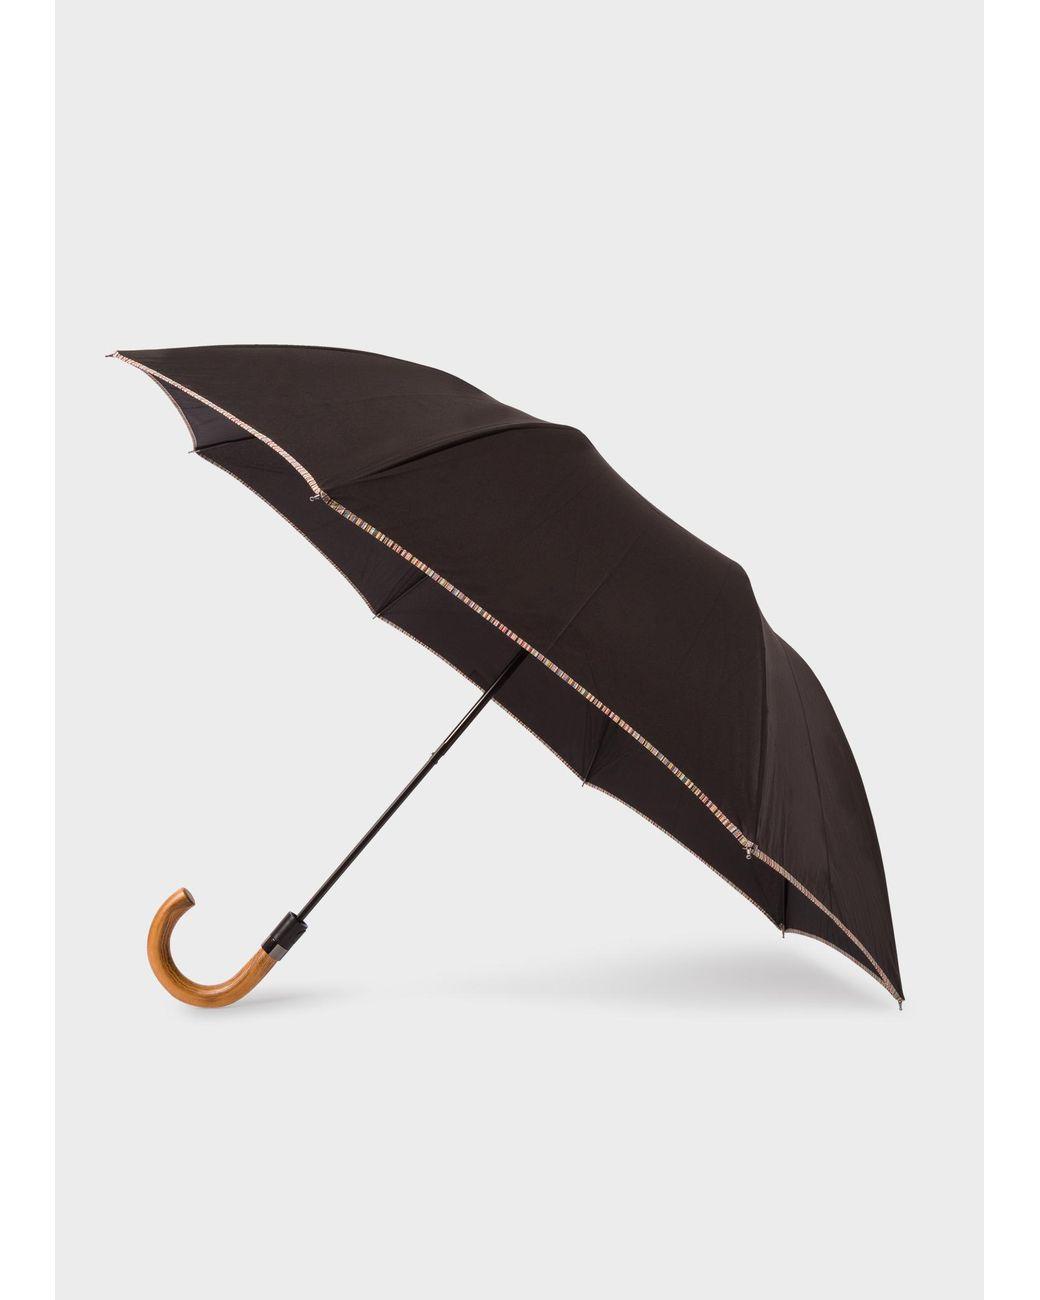 Black Guinness Embossed Umbrella 100Cm Diameter